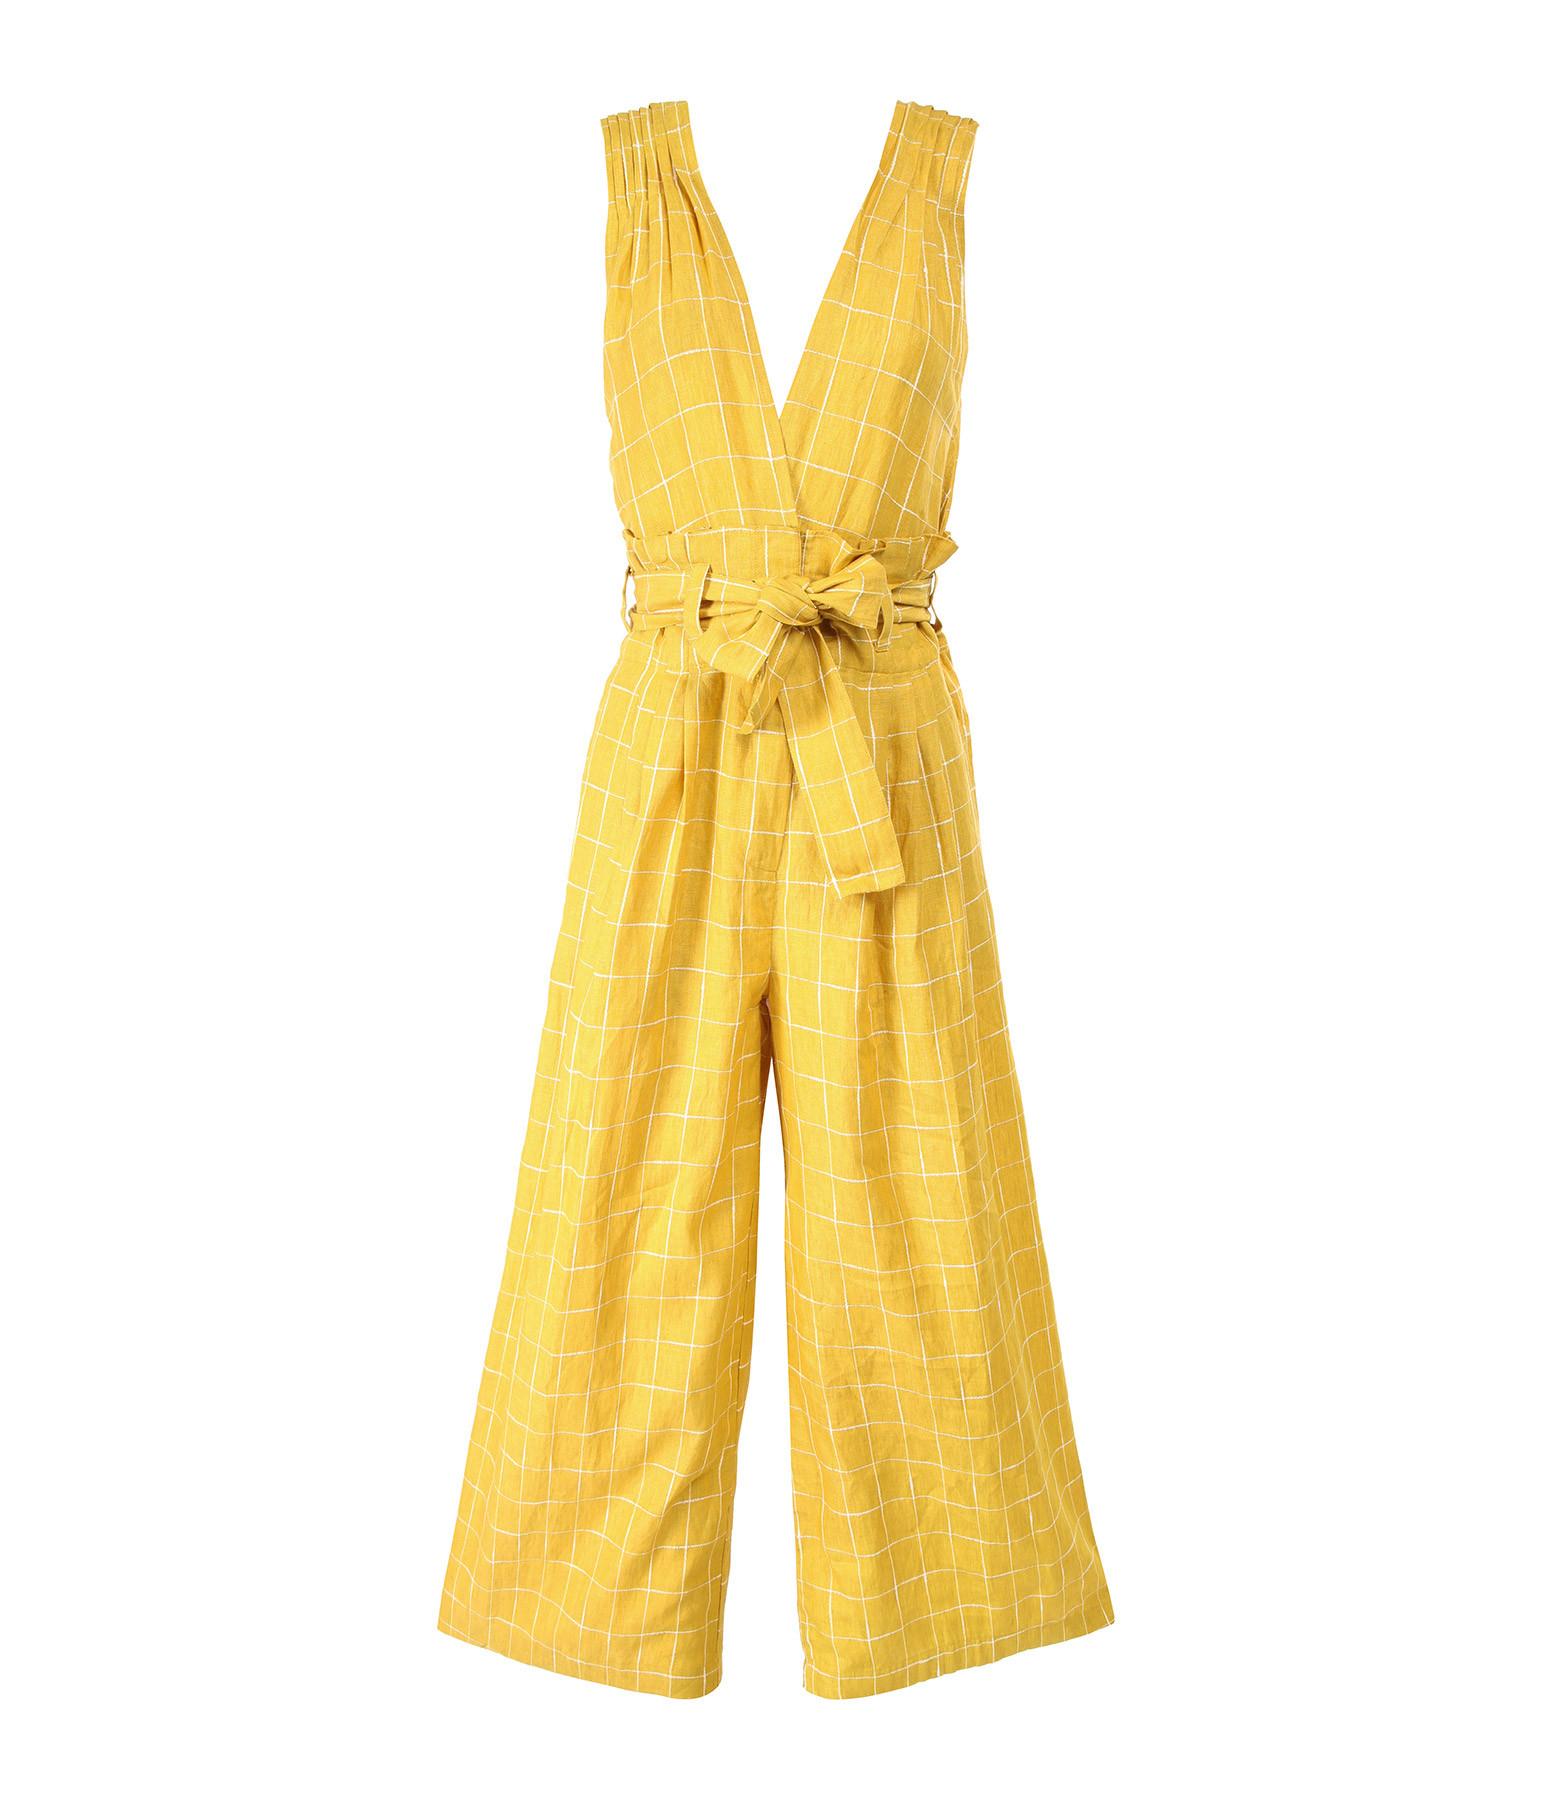 MES DEMOISELLES - Combinaison Pantalon Cancun Lin Jaune